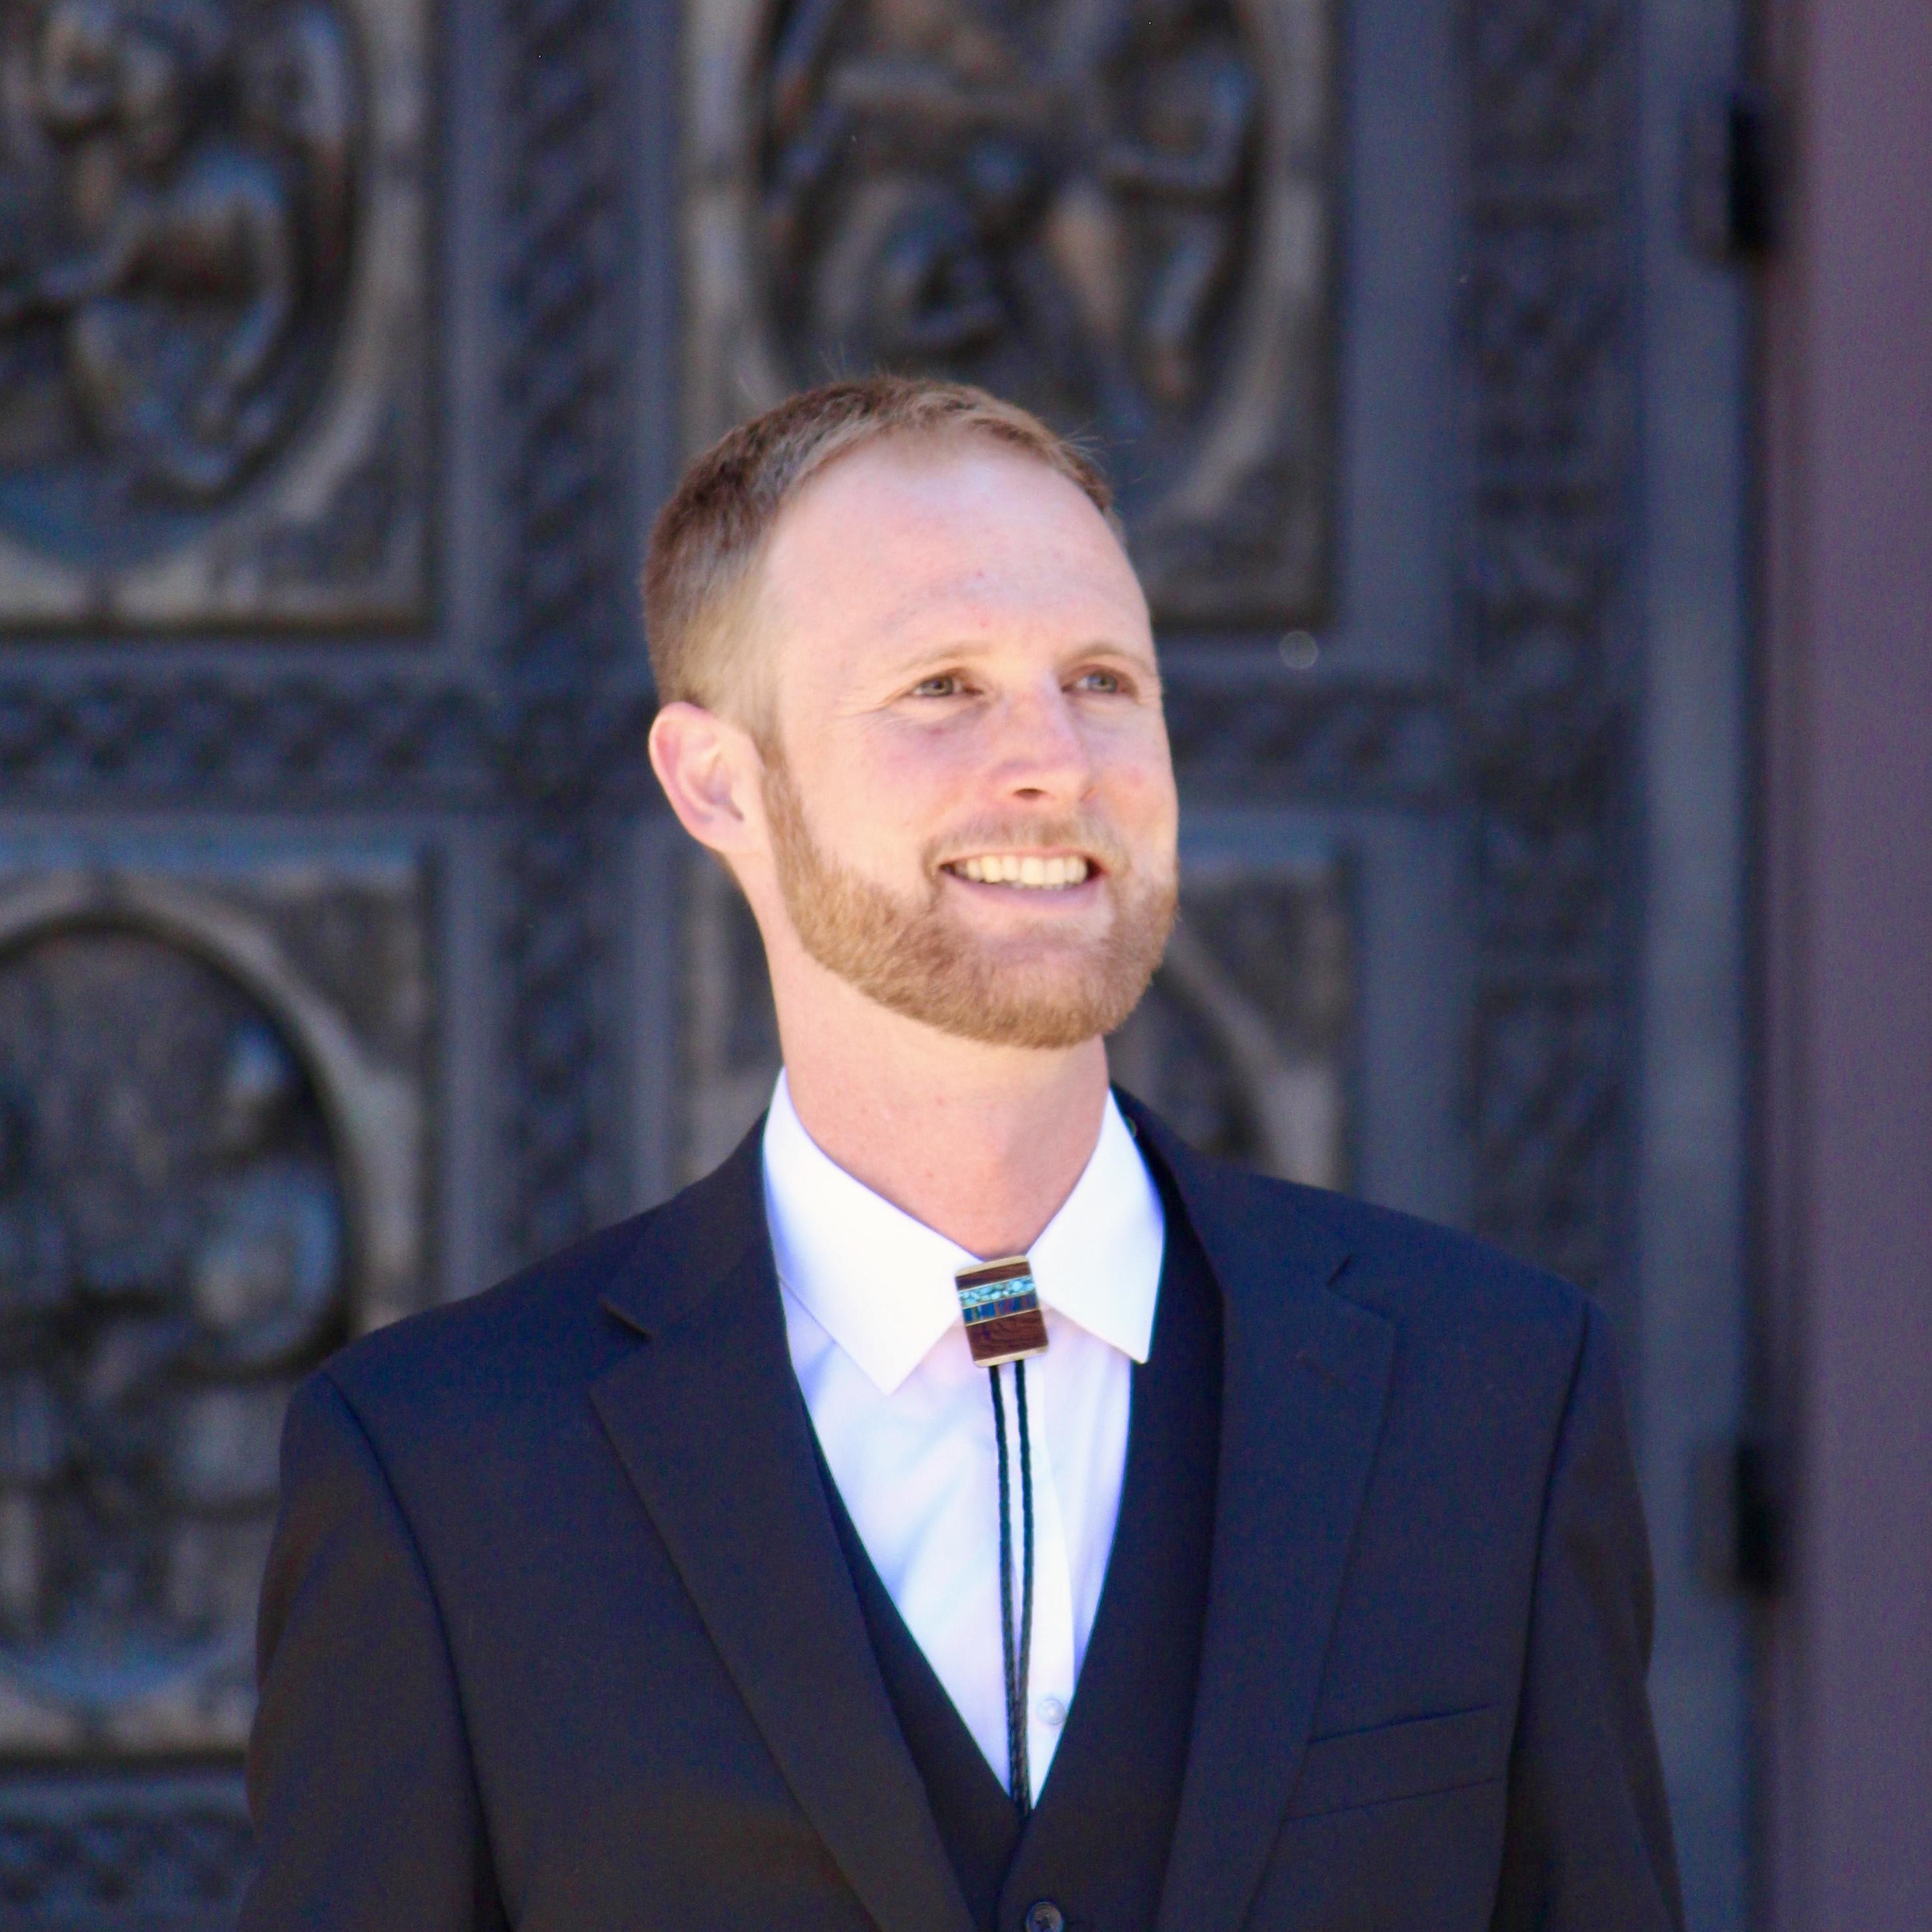 Daniel Huberman Associate Broker Santa Fe Realty Ultd